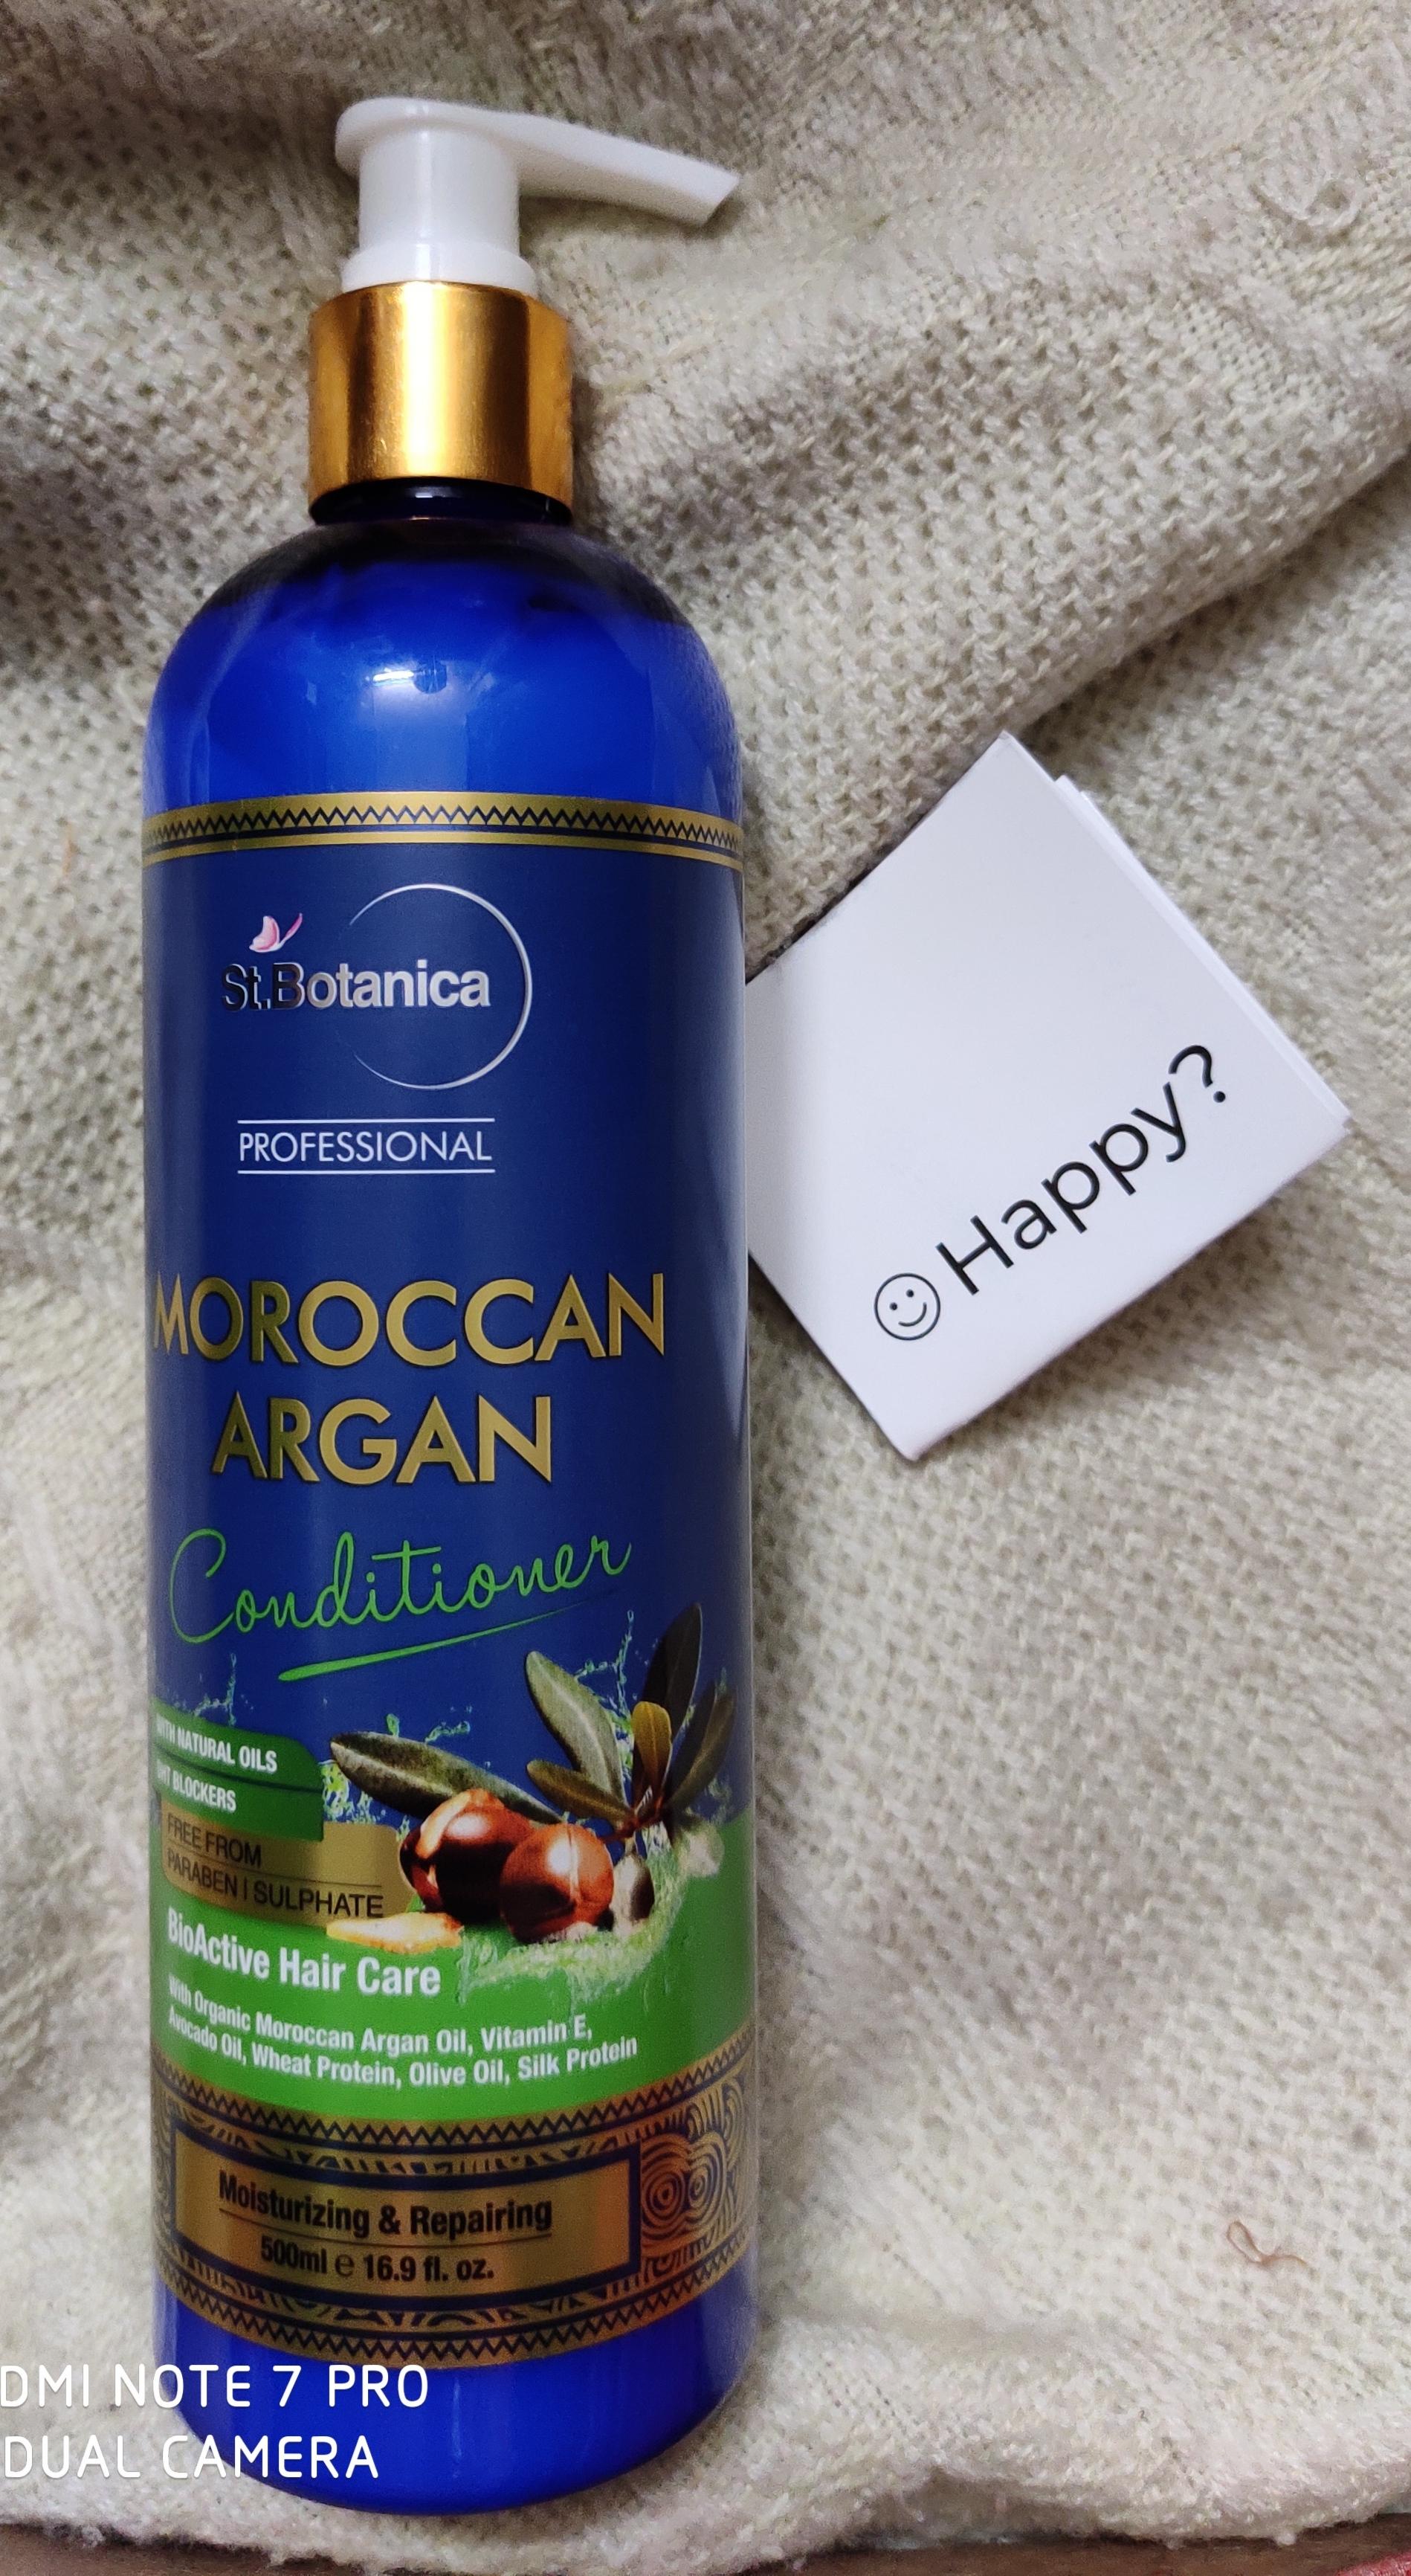 St.Botanica Professional Moroccan Argan Conditioner-Good conditioner-By shalakaempathy